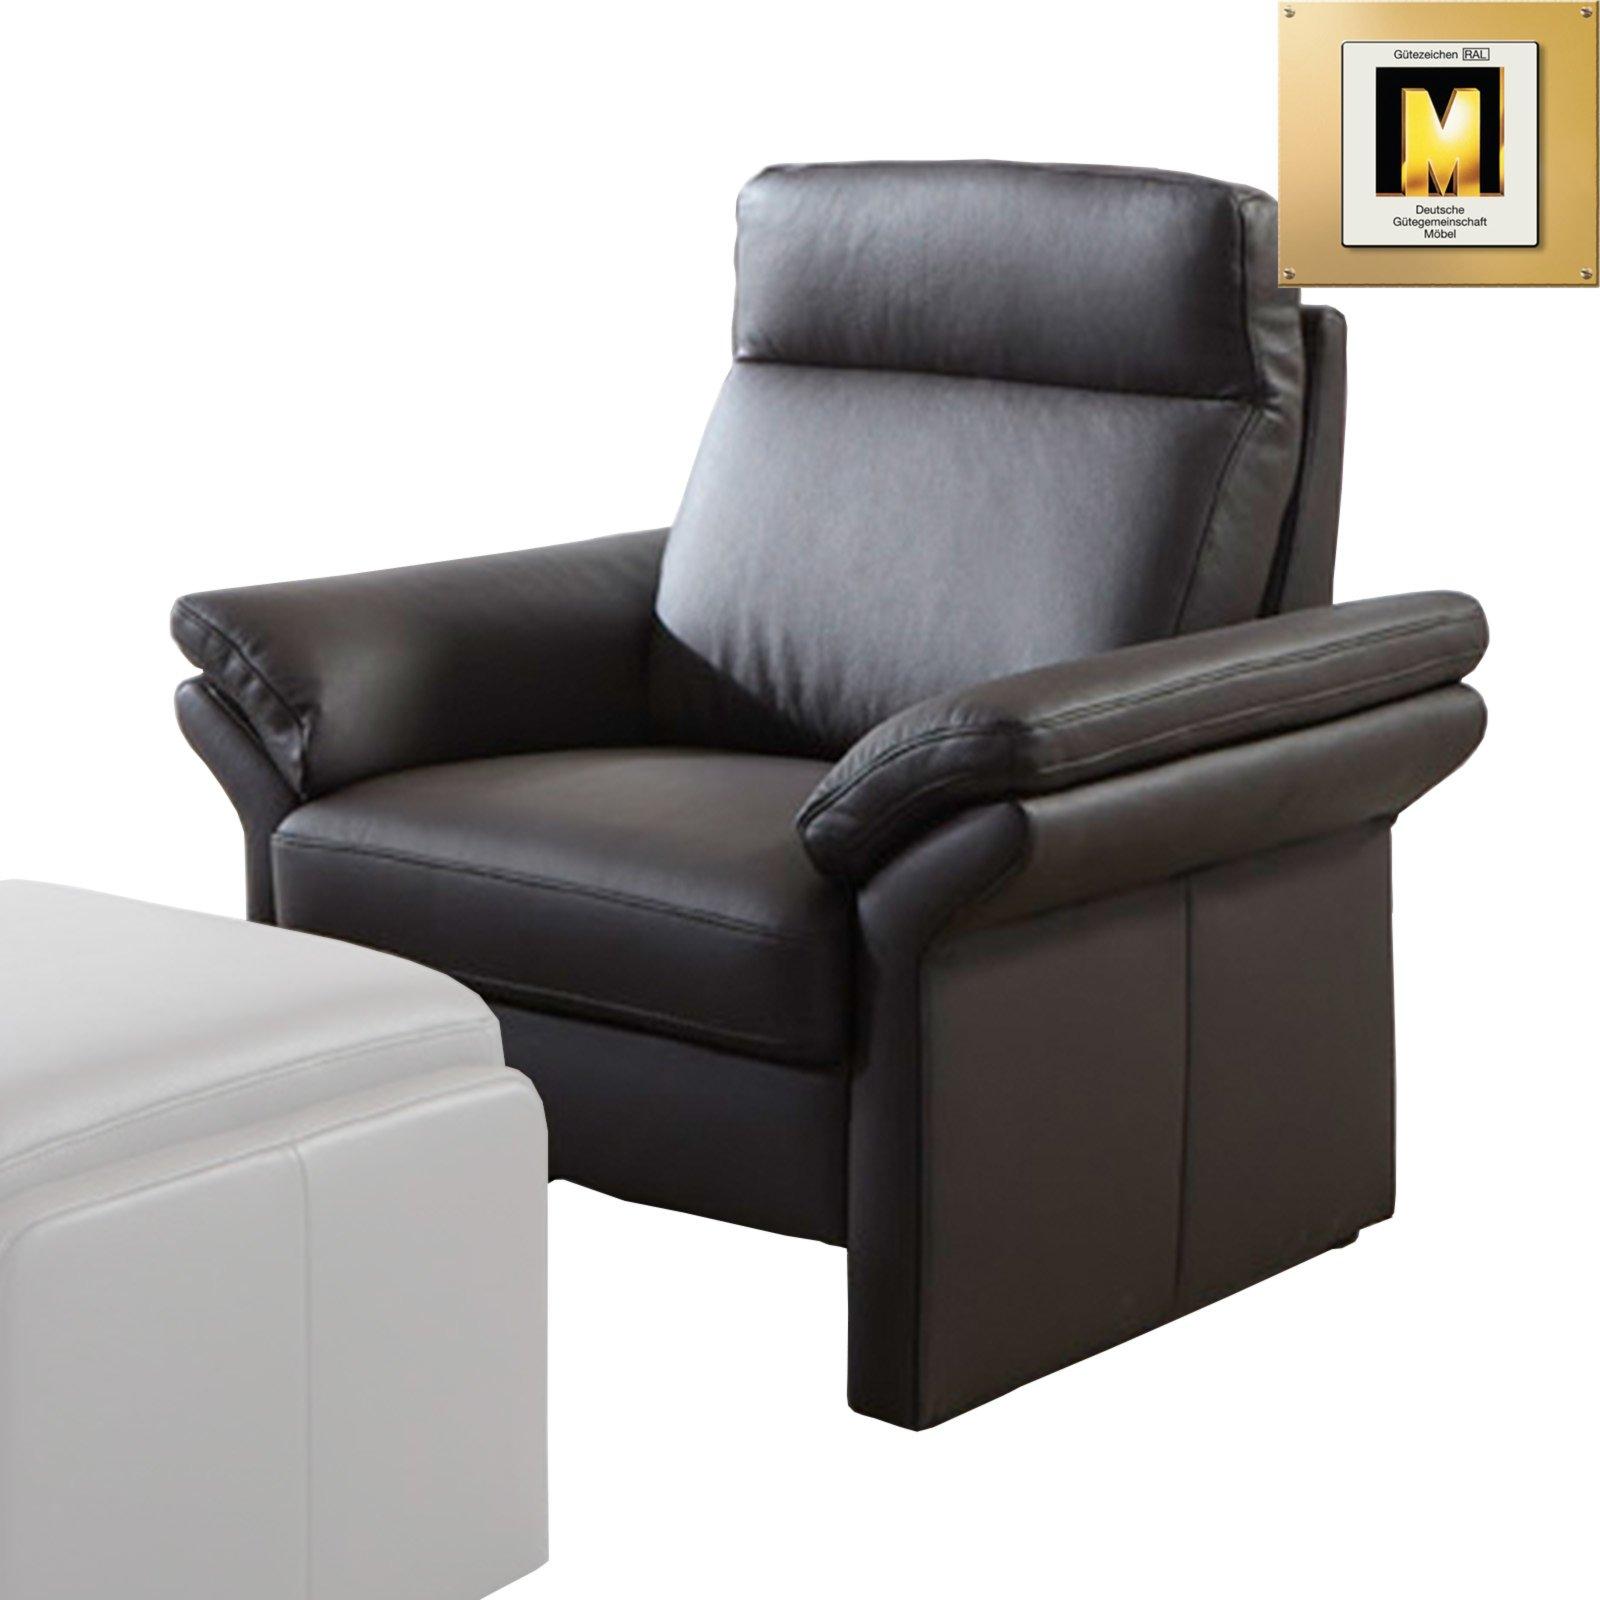 ledersessel braun federkern polstergarnitur braun federkern sofagarnituren sets. Black Bedroom Furniture Sets. Home Design Ideas